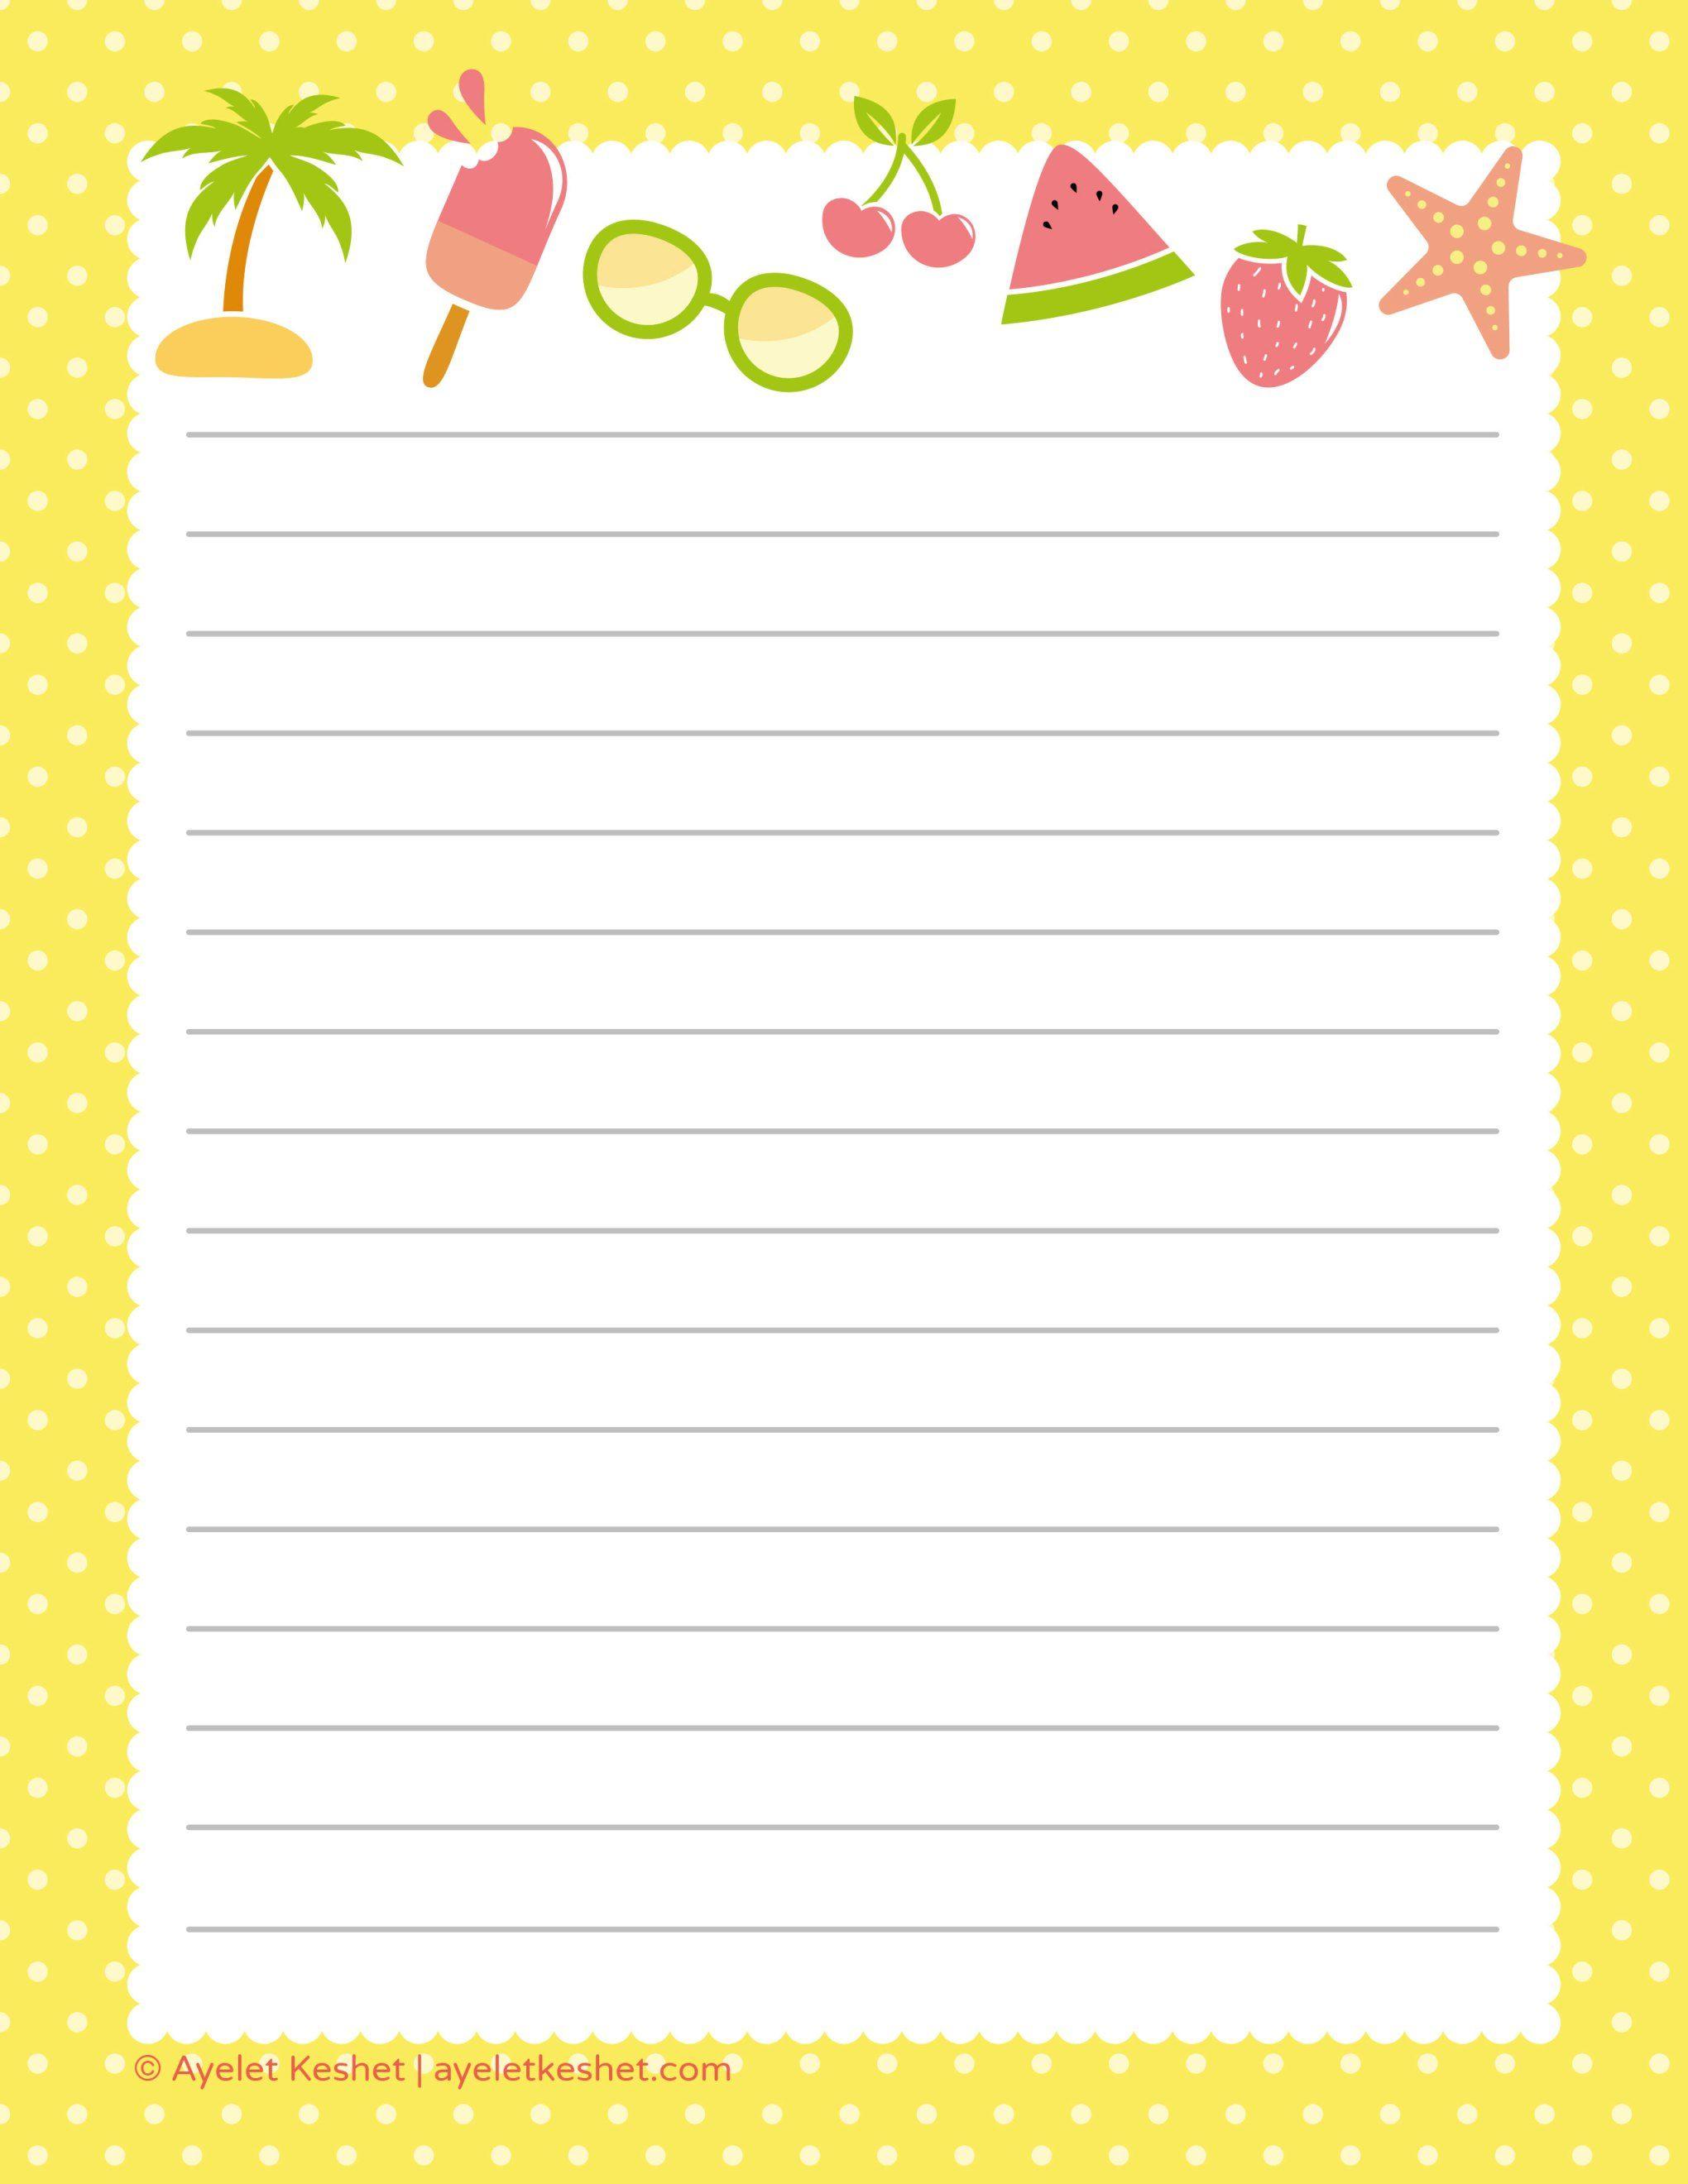 Free Printable Letter Paper | Printables To Go | Pinterest - Free Printable Stationary Pdf